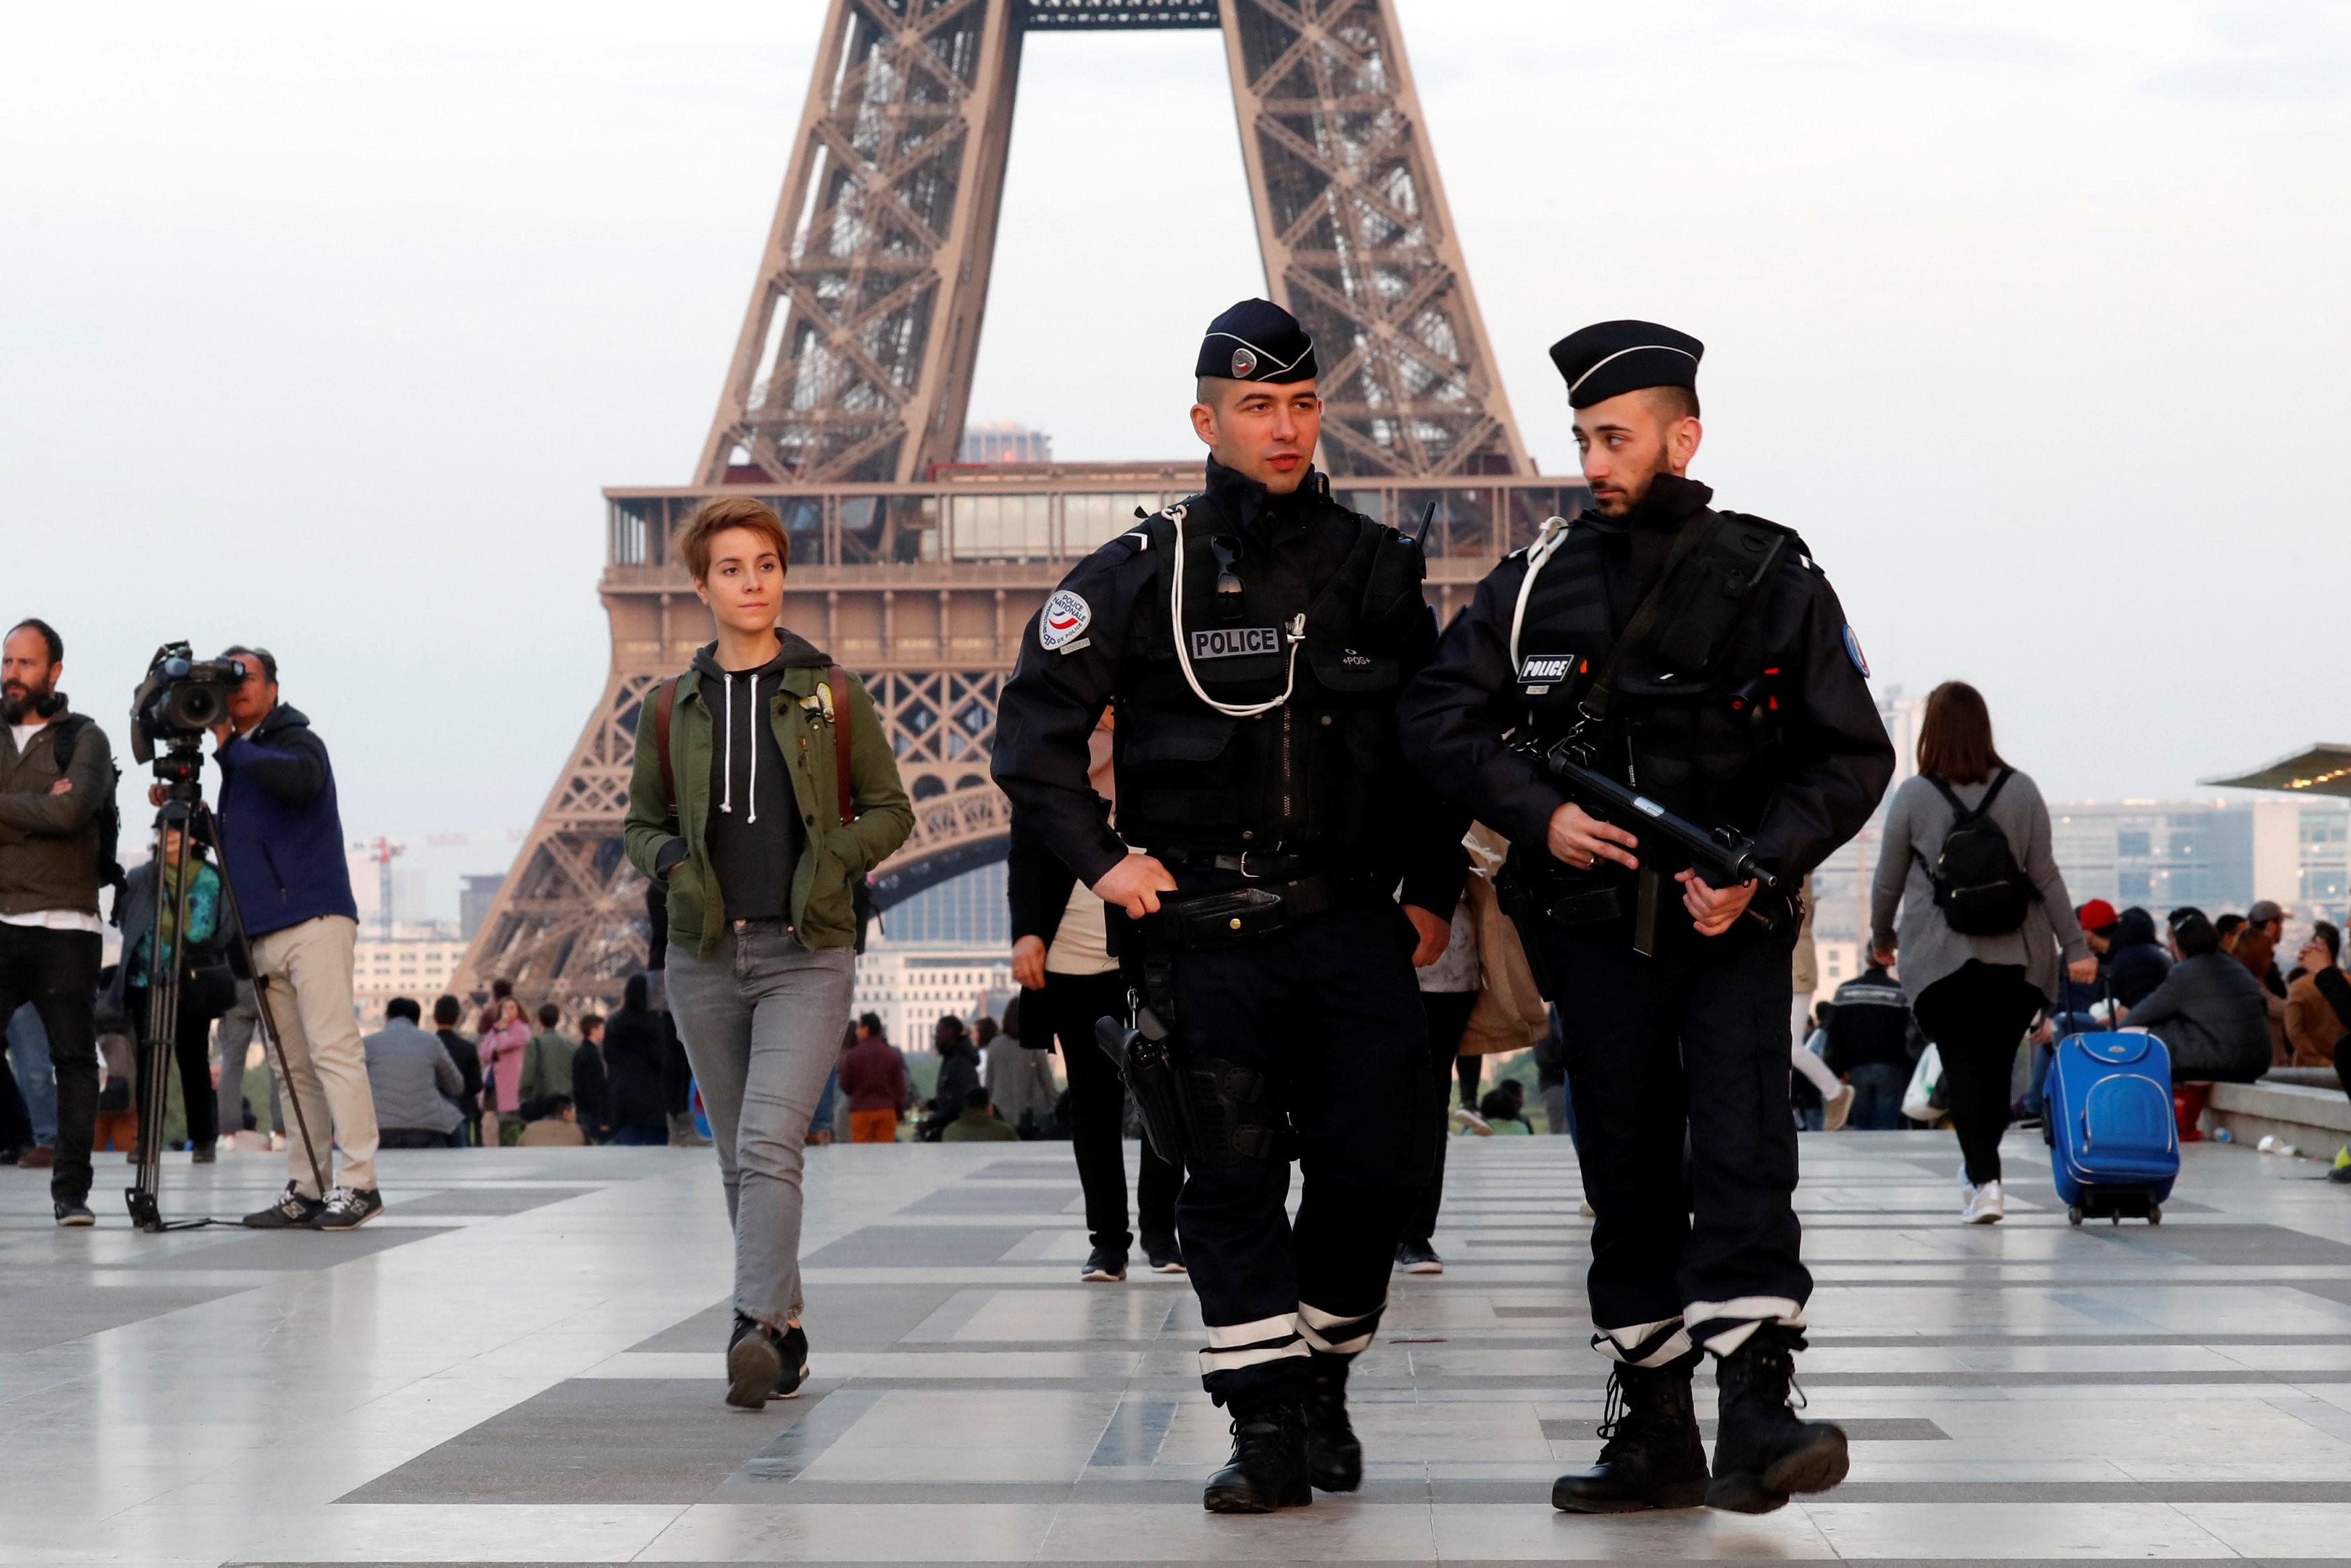 <p><span>Фото: &copy; REUTERS/Charles Platiau</span></p>